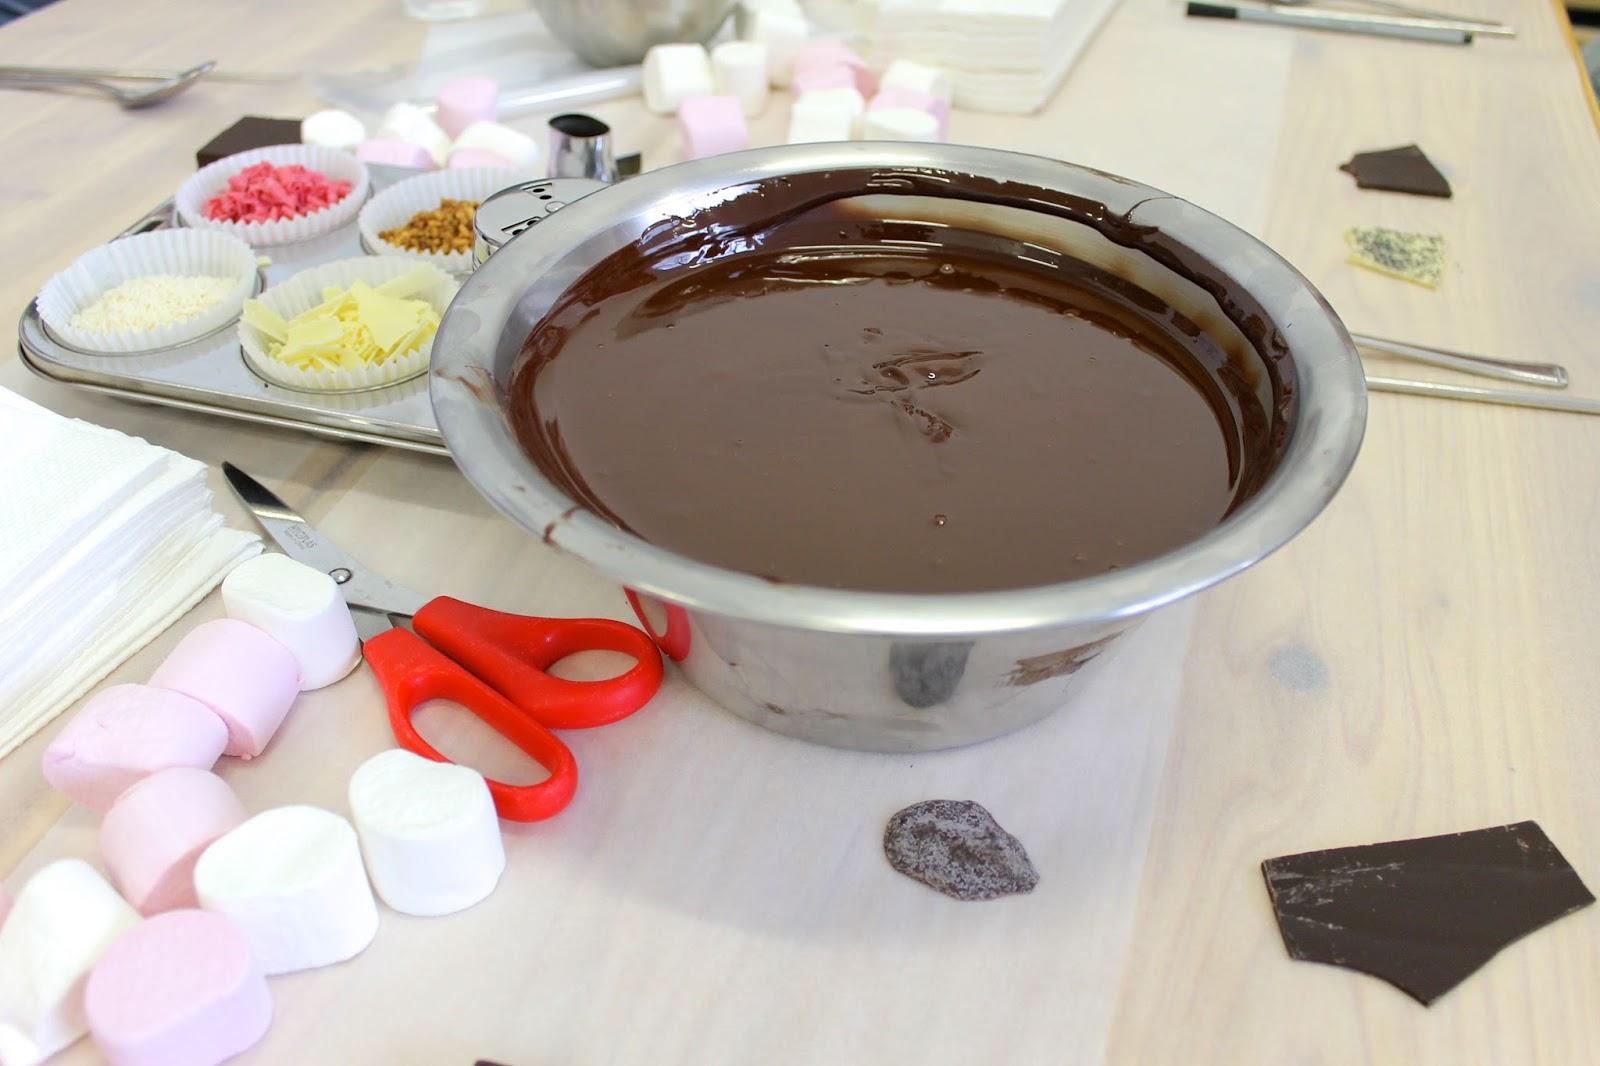 Making chocolate london